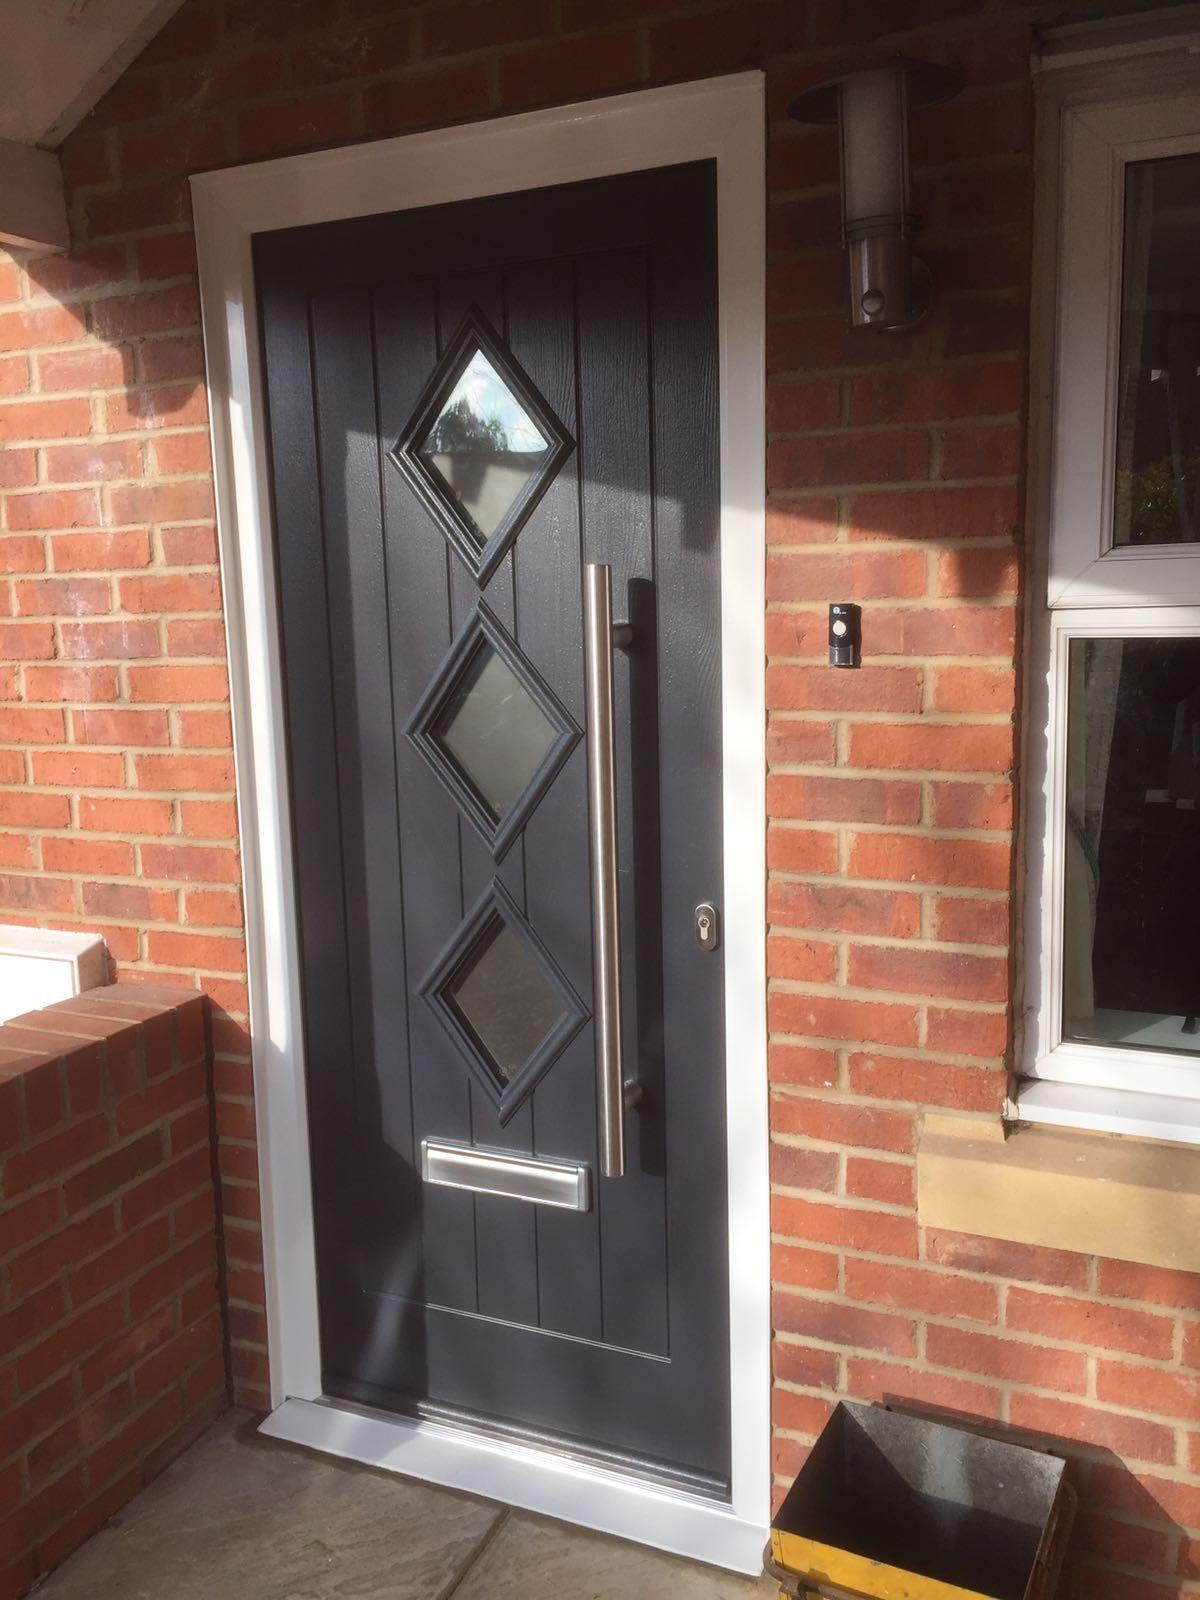 Endurance Doors - Eldon - Anthracite Grey & Endurance Doors - Eldon - Anthracite Grey | Front doors ... pezcame.com